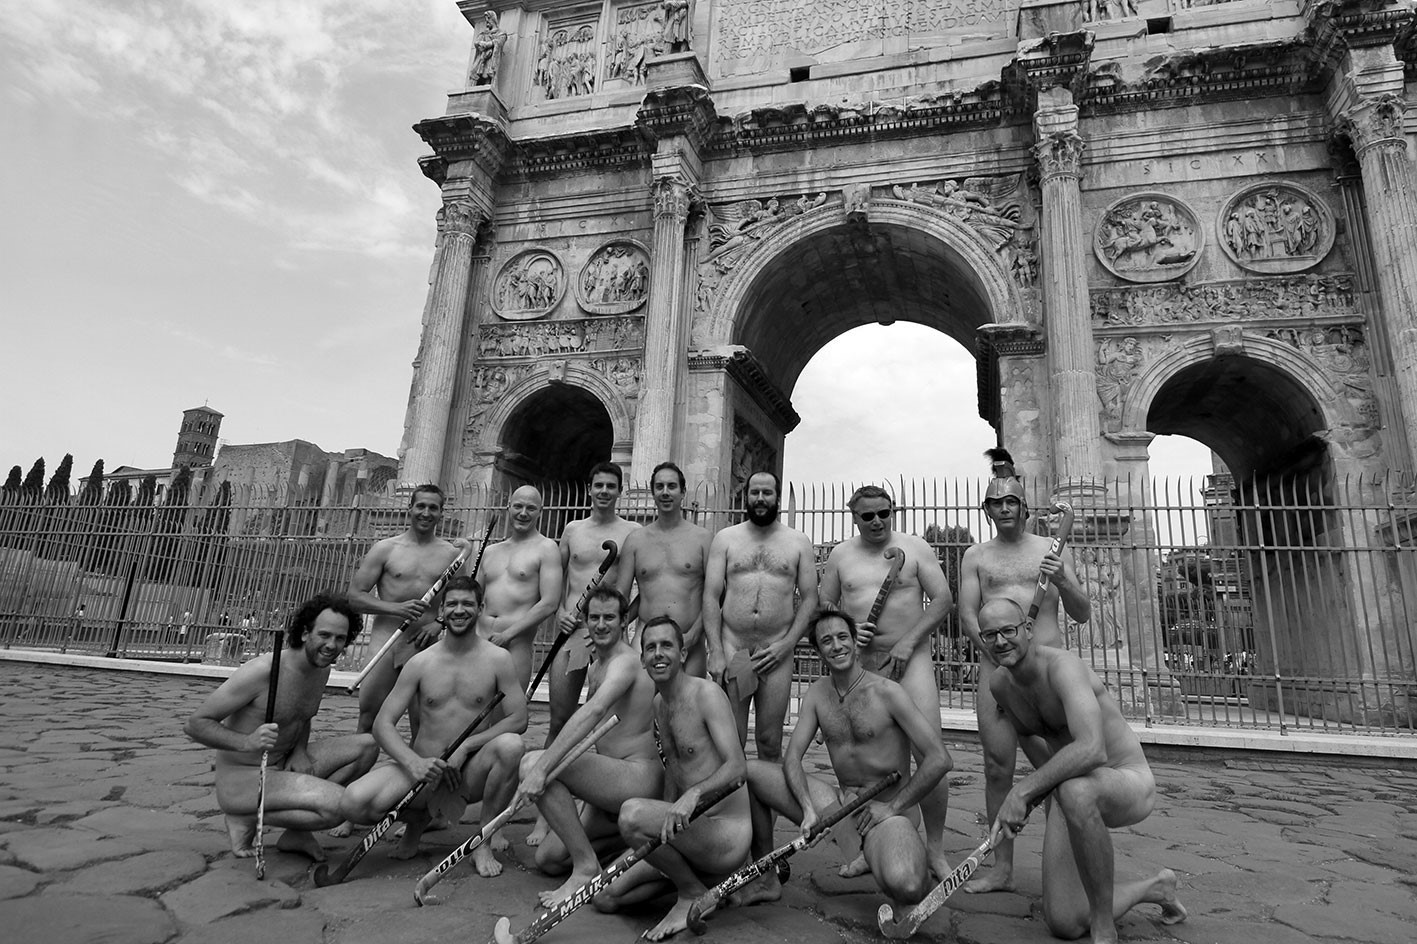 Het Luikse hockeyteam in Rome (2015), Sébastien Bourguignon